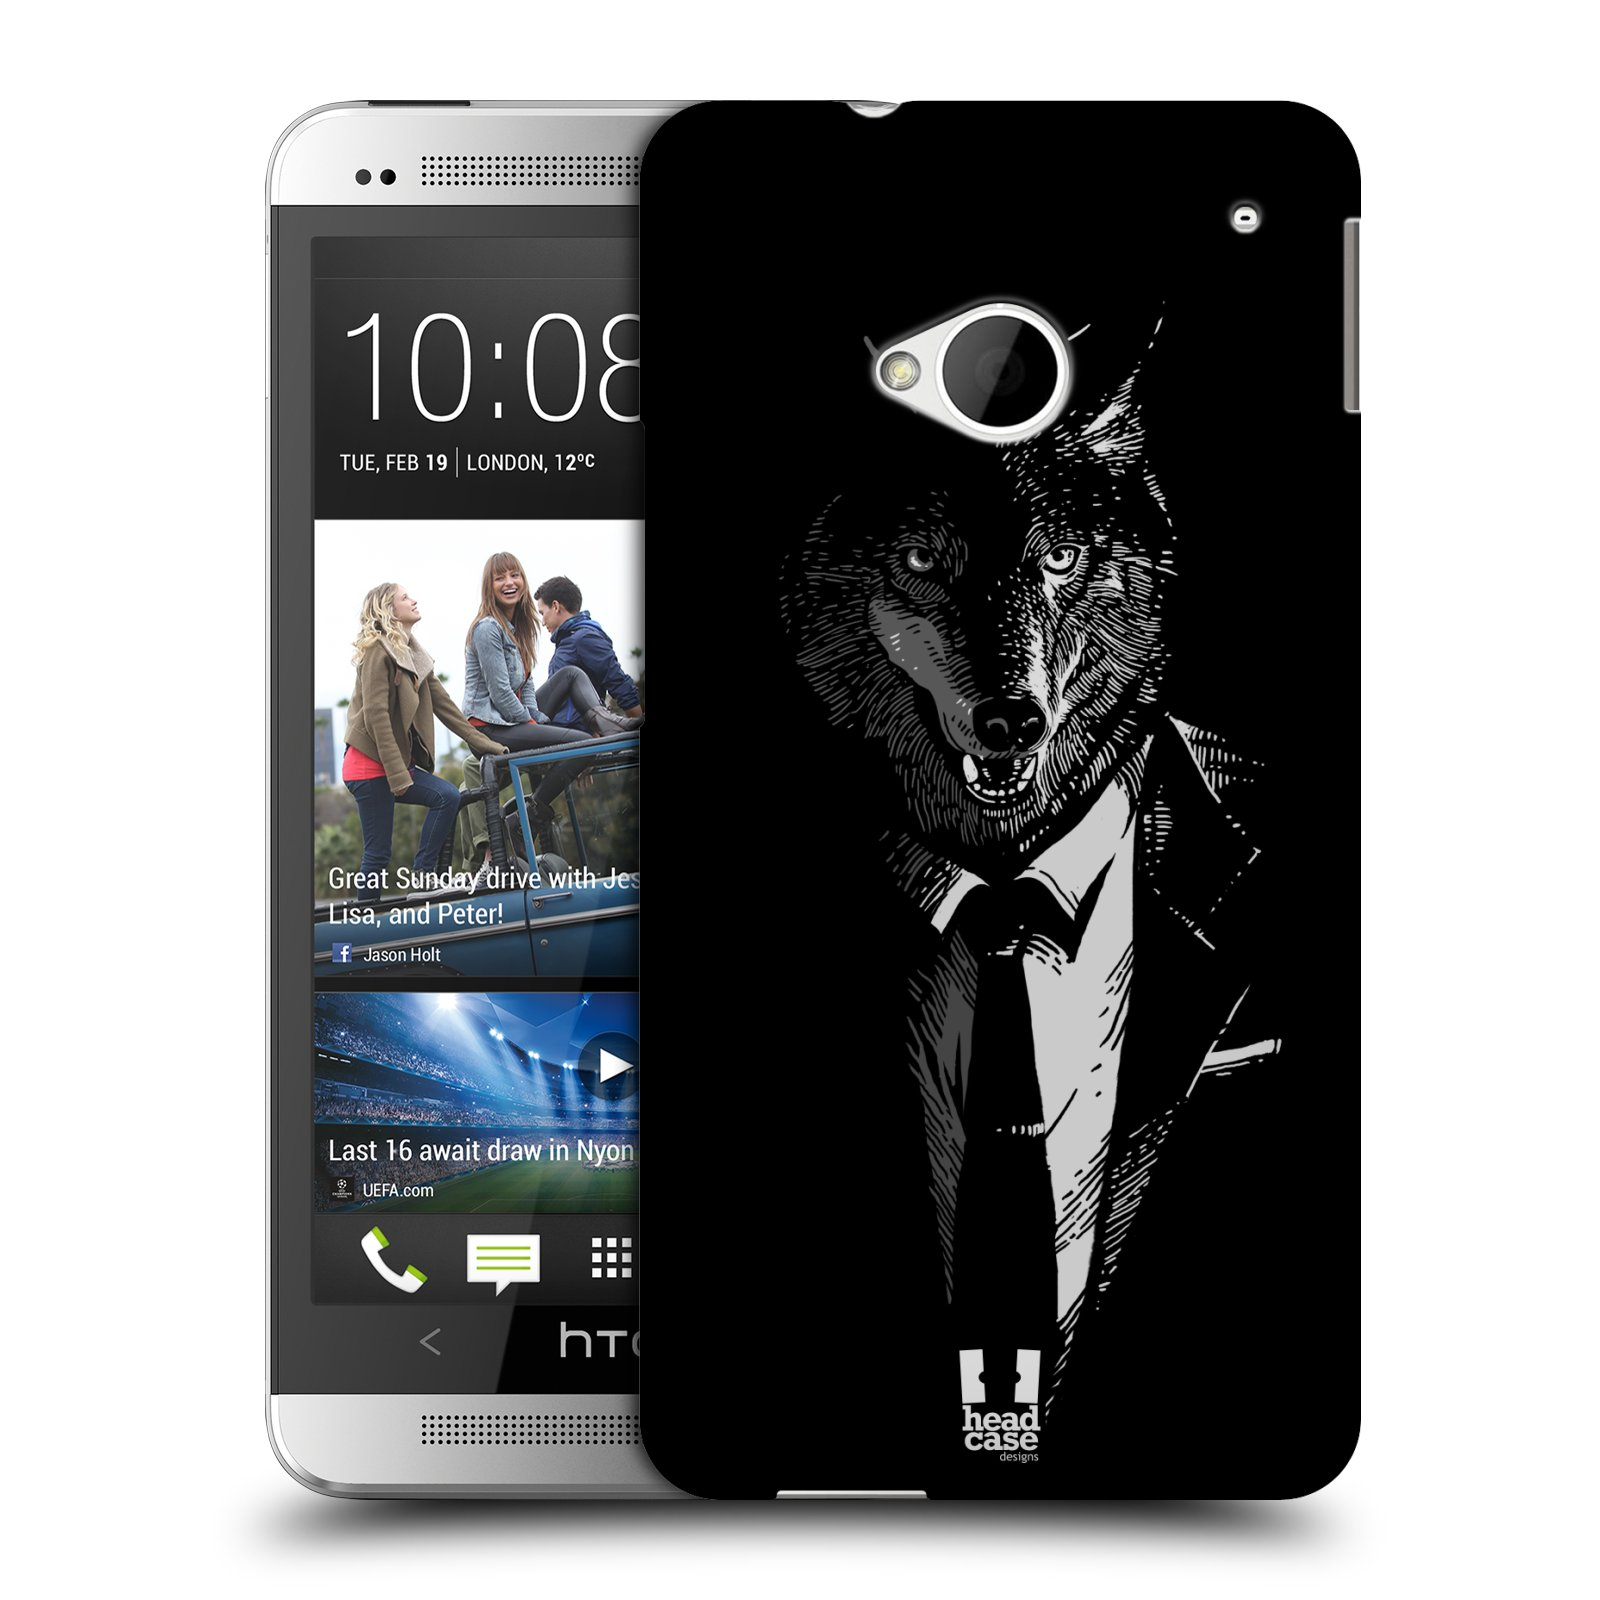 HEAD CASE plastový obal na mobil HTC One (M7) vzor Zvíře v obleku vlk